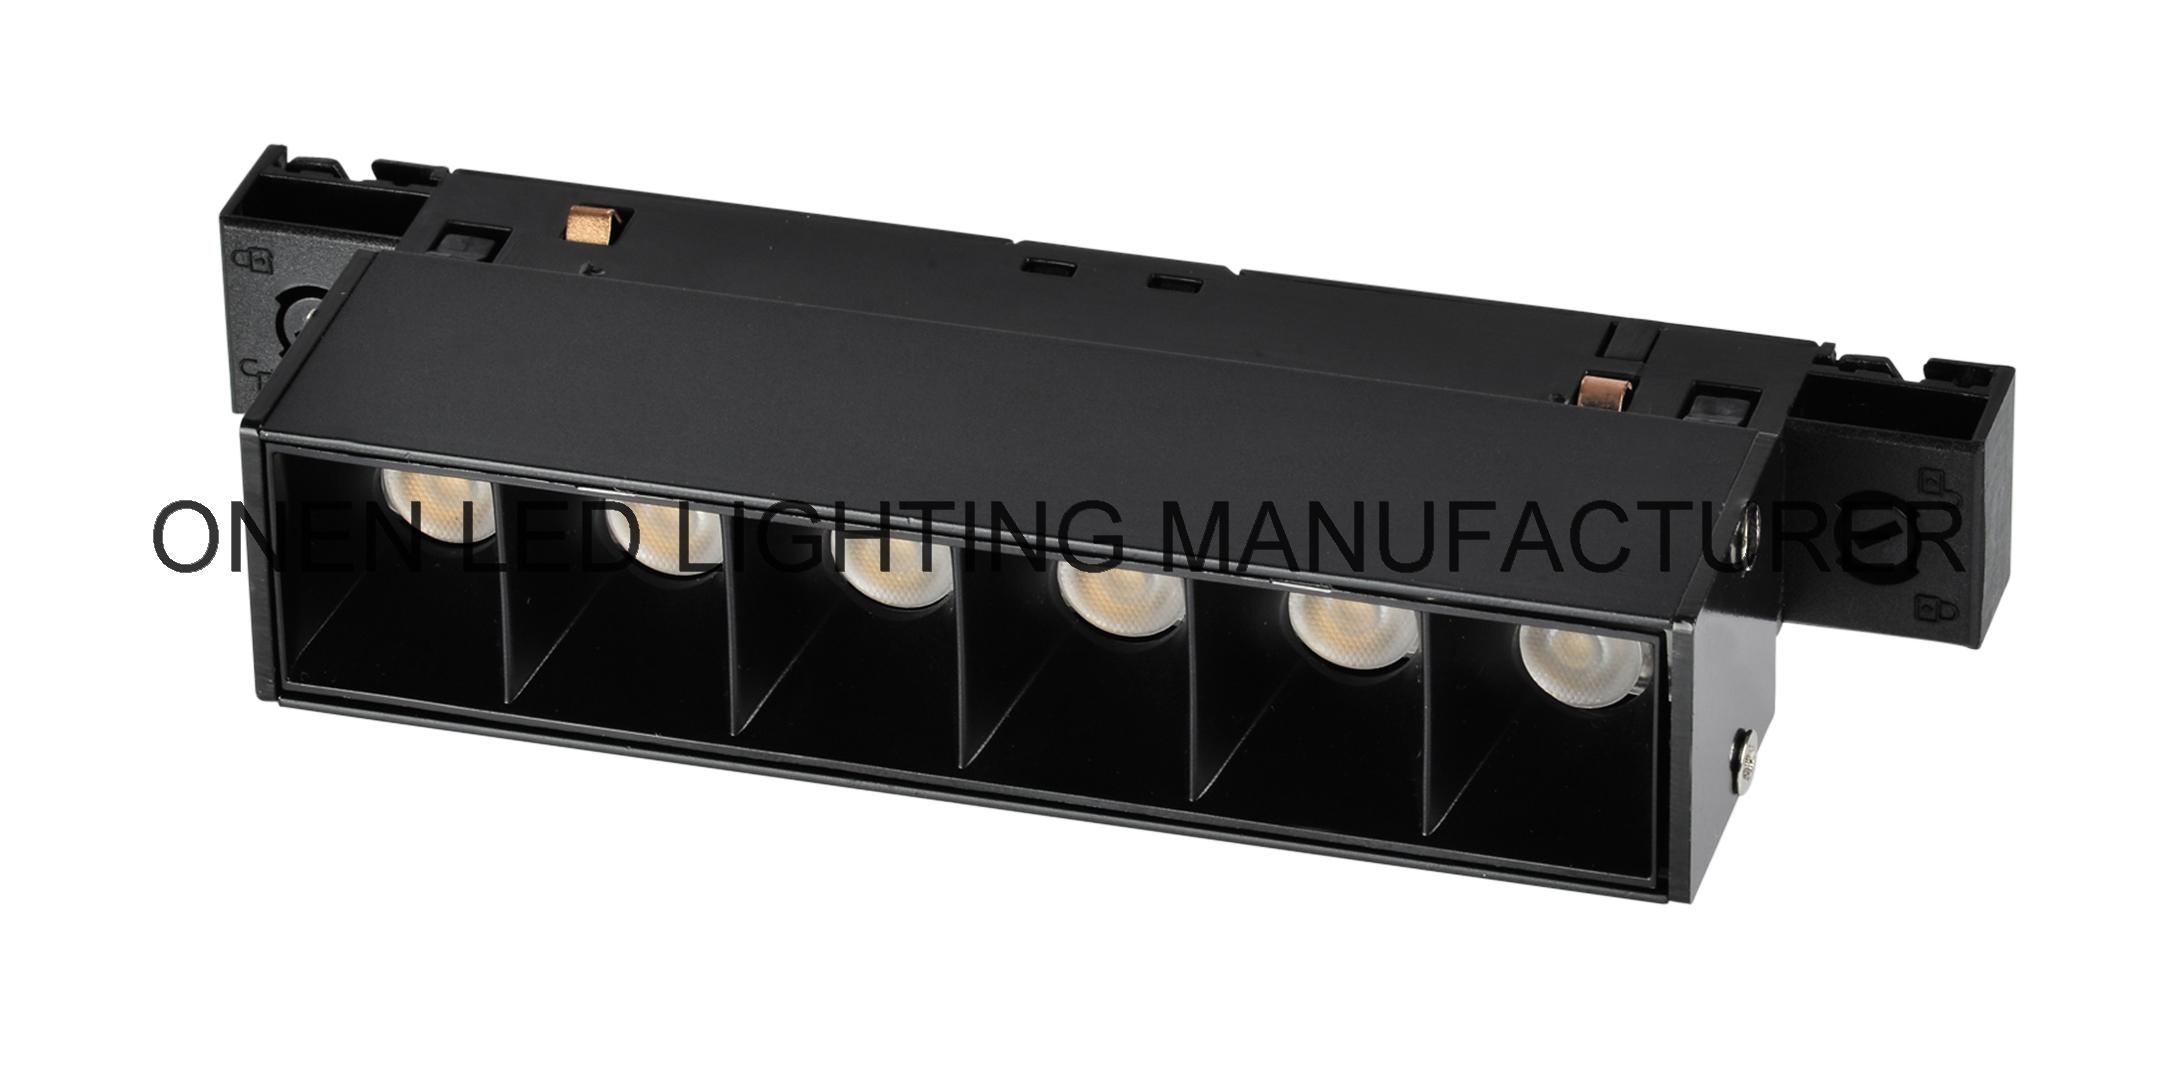 ounen compact system adjustable high contrast track spotlight 23SCG6-6W